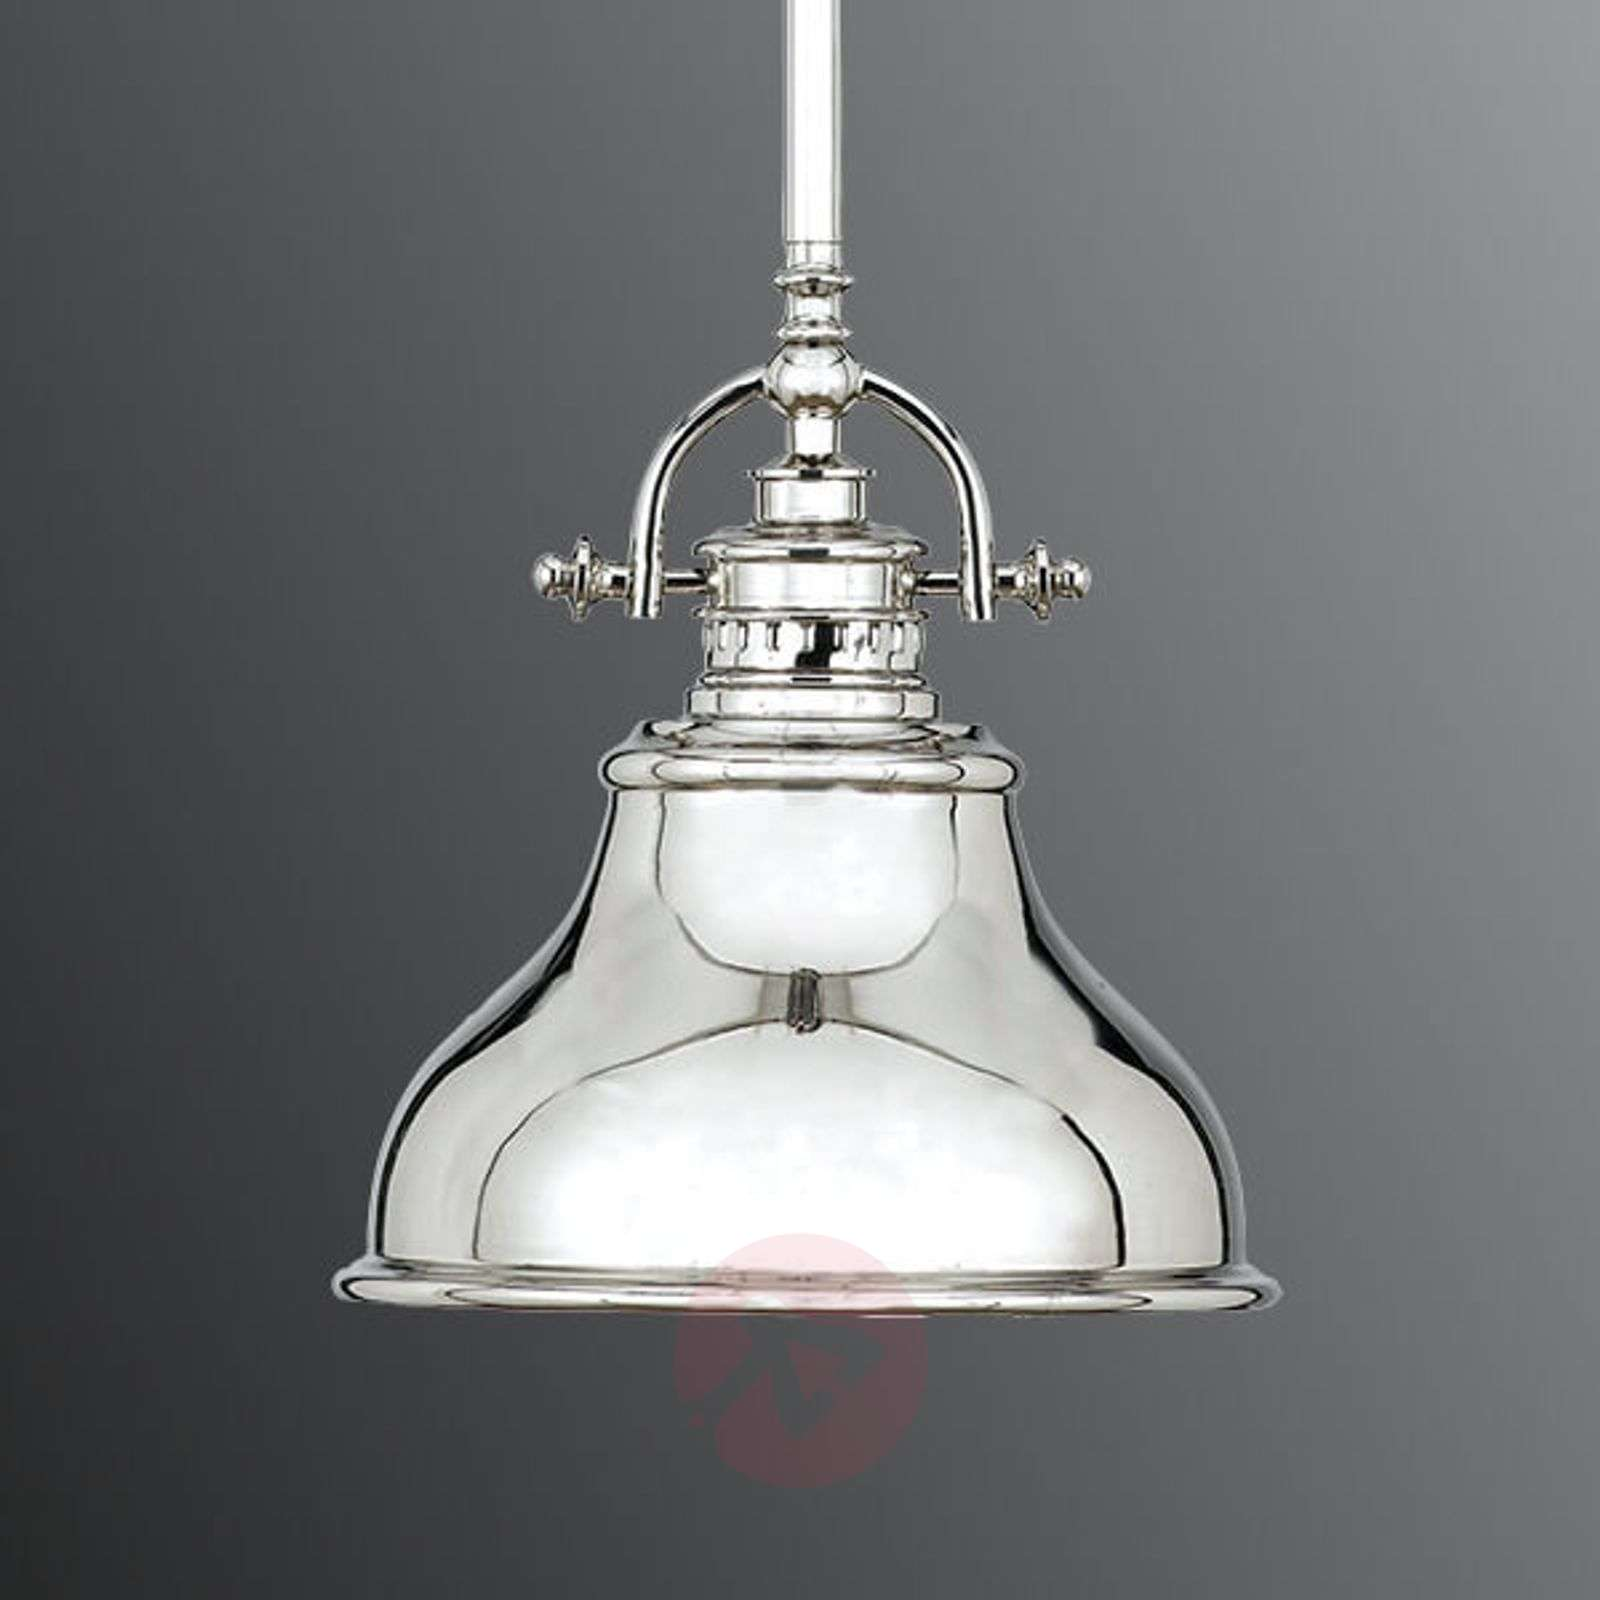 Classic American pendant light Emery-3048609-01